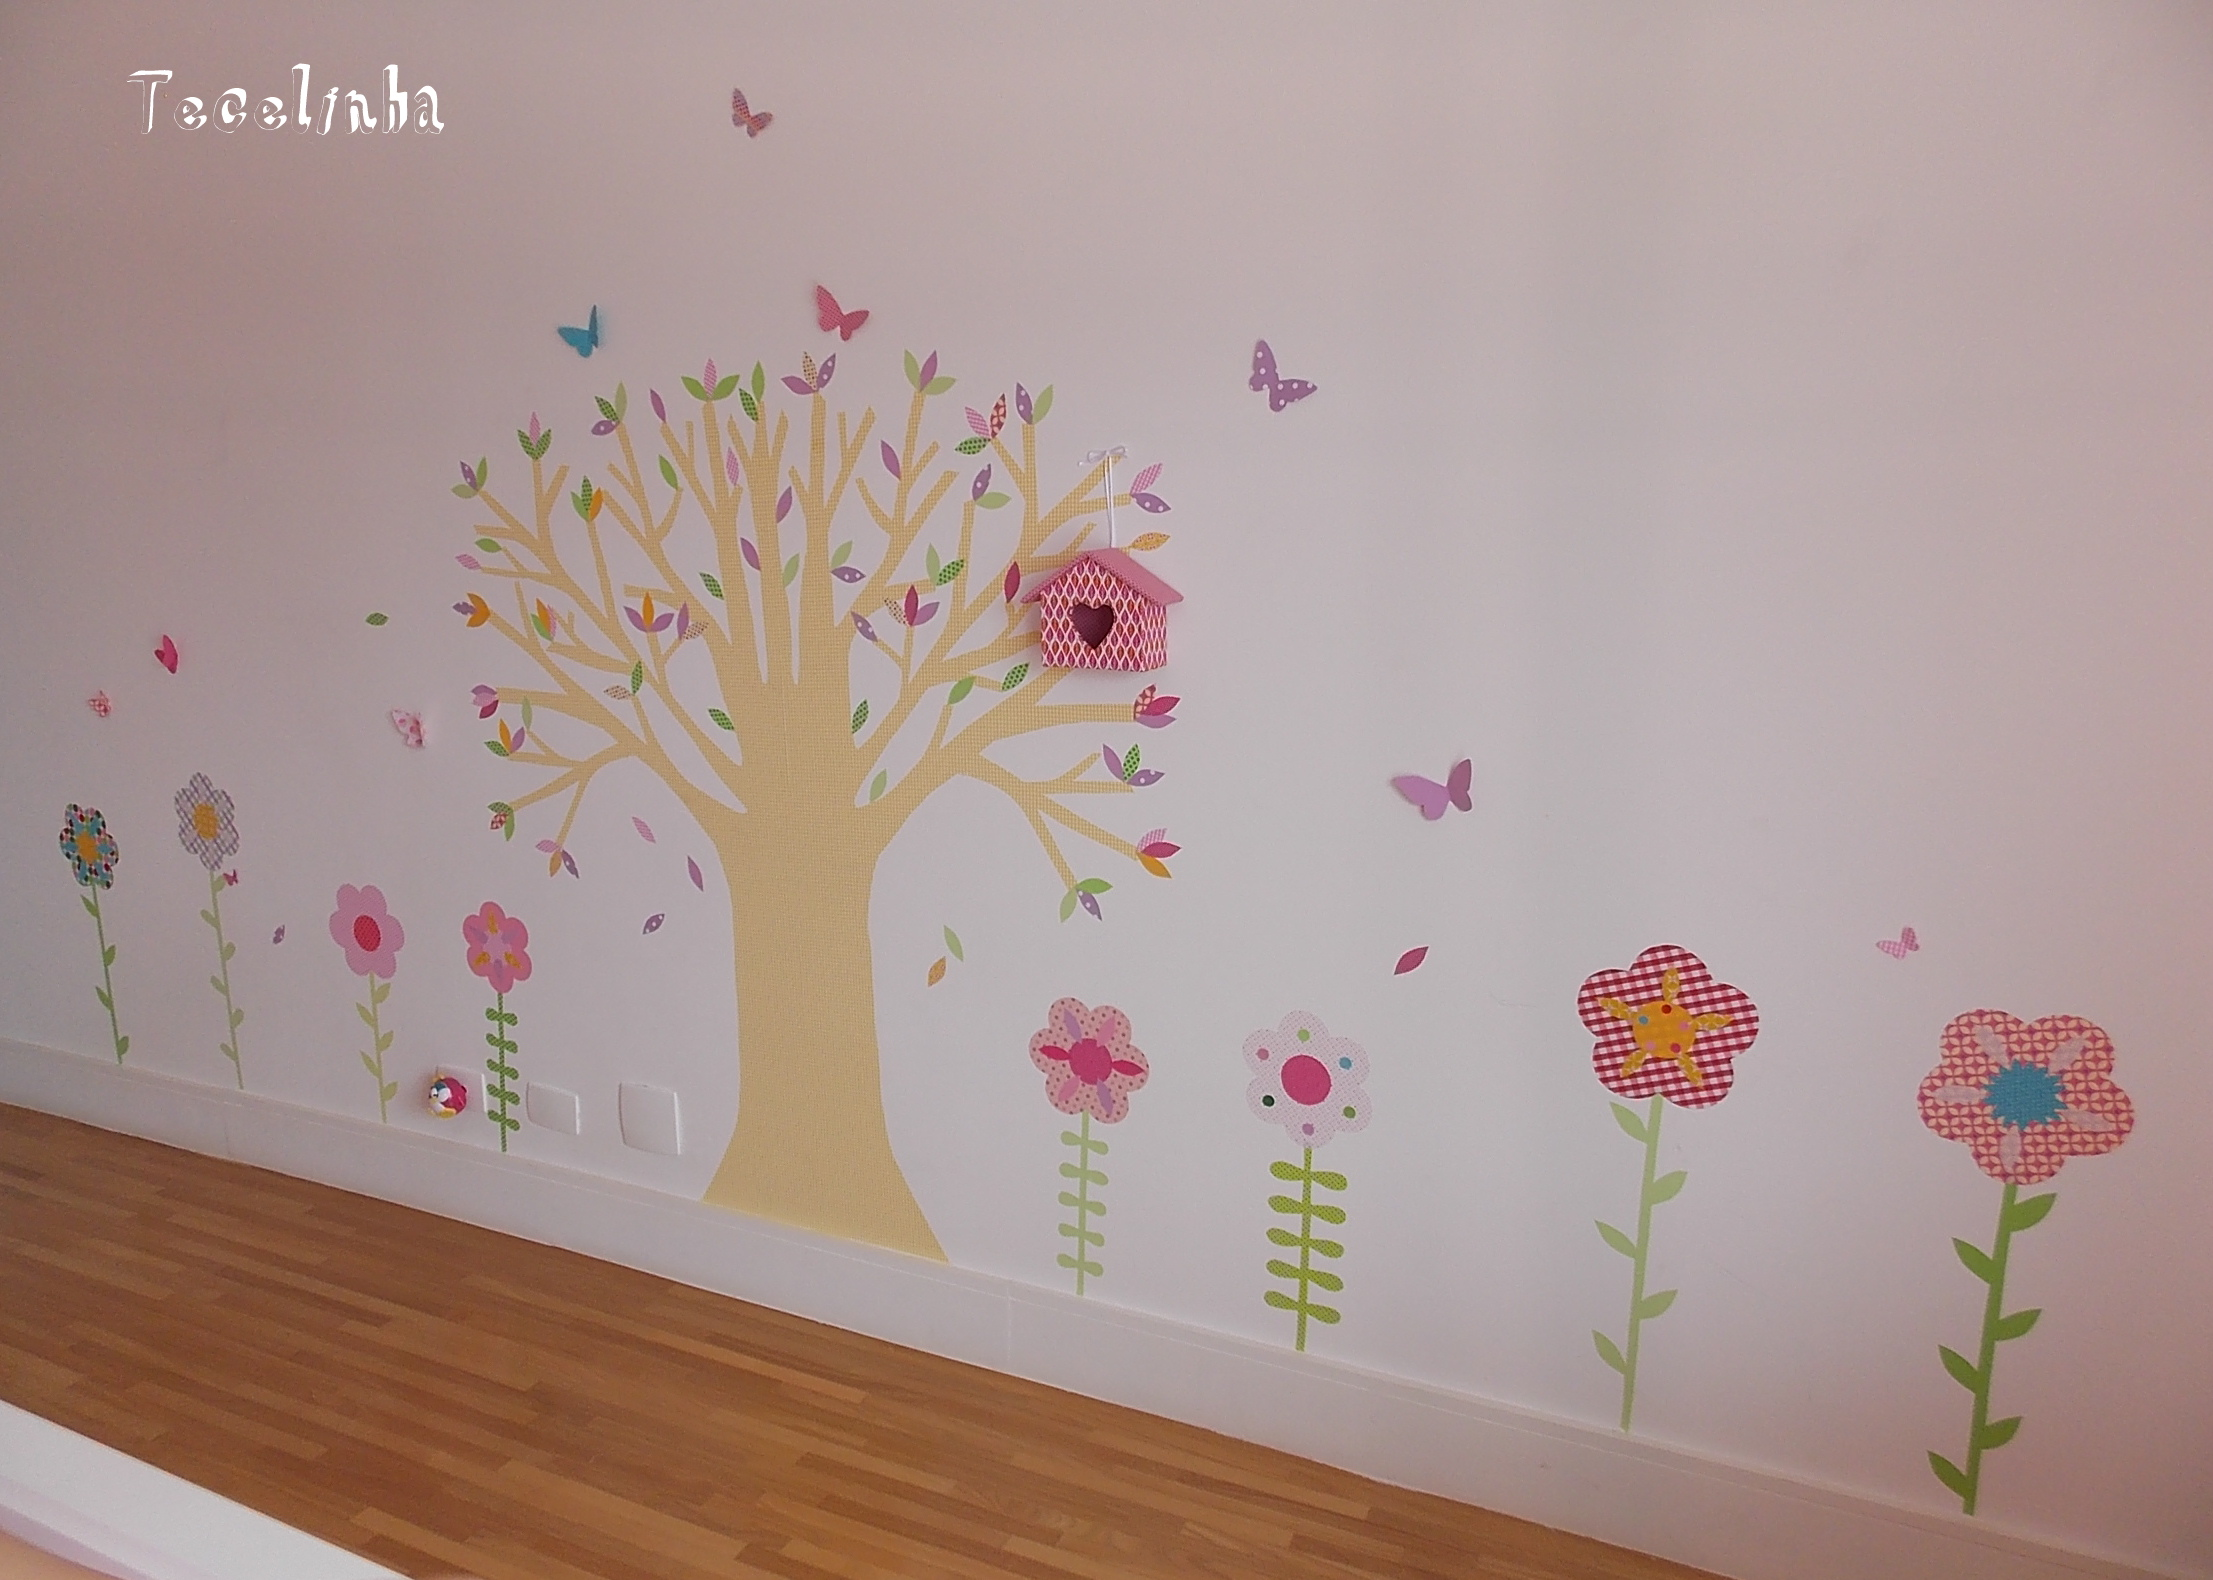 decoracao quarto de bebe jardim encantado : decoracao quarto de bebe jardim encantado:jardim encantado com arvore adesivos quarto de menina jardim encantado